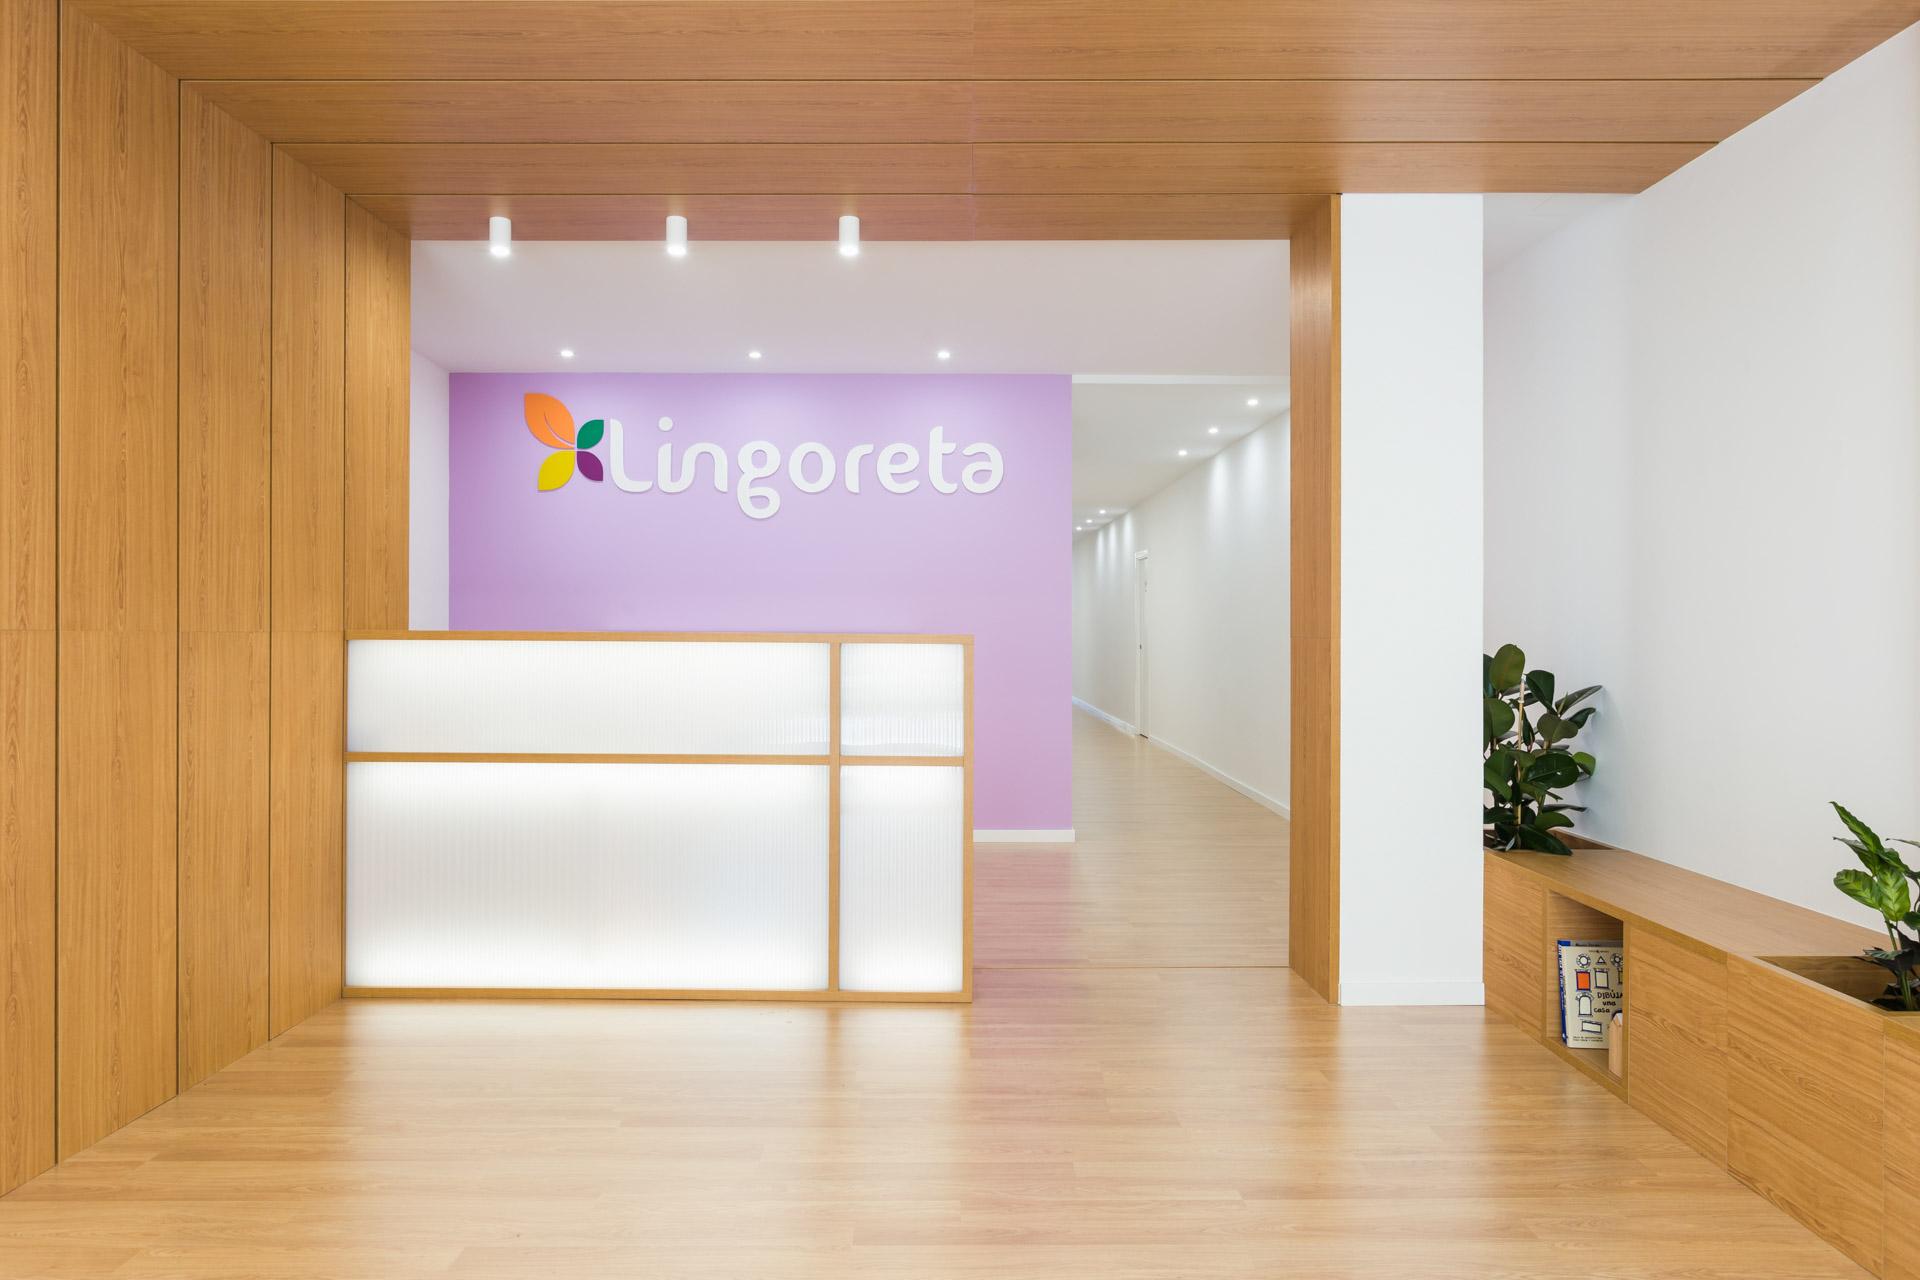 Centro Logopedia Lingoreta | Encaixe Arquitectura - Centro Logopedia Lingoreta | Encaixe Arquitectura - Centro Logopedia Lingoreta | Jose Chas | Fotografía de arquitectura